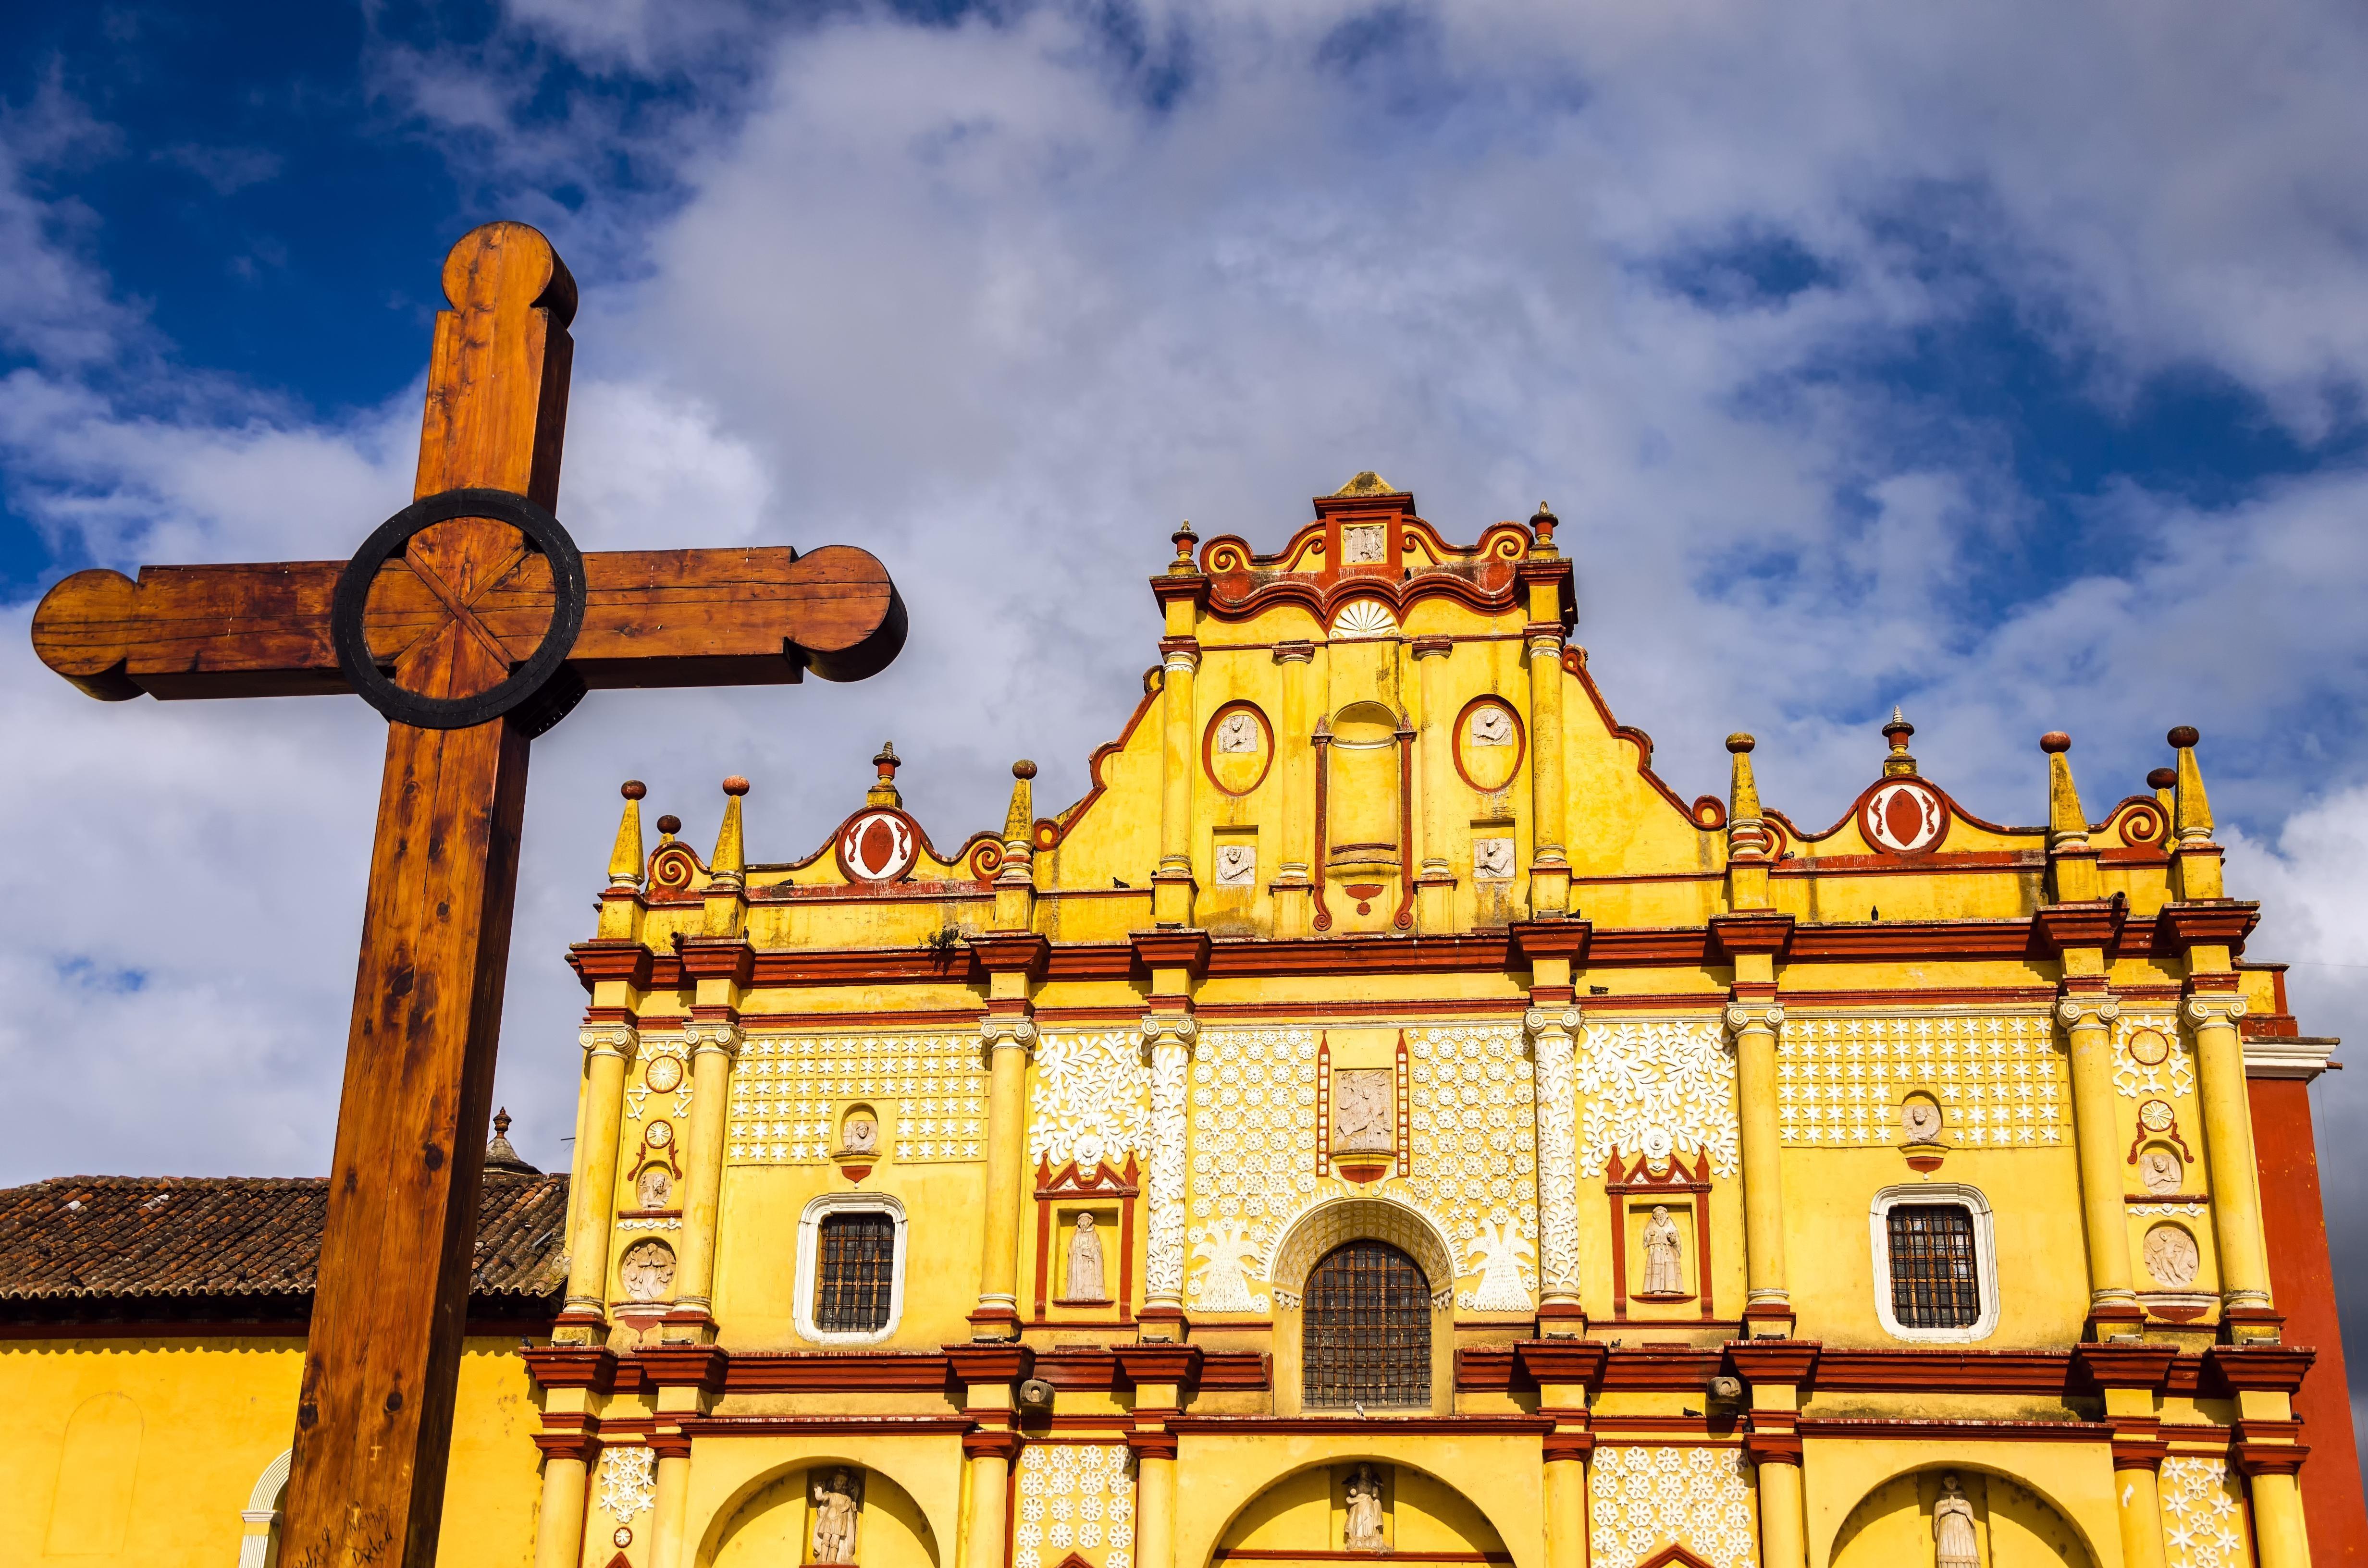 How to Spend 2 Days in San Cristóbal de las Casas